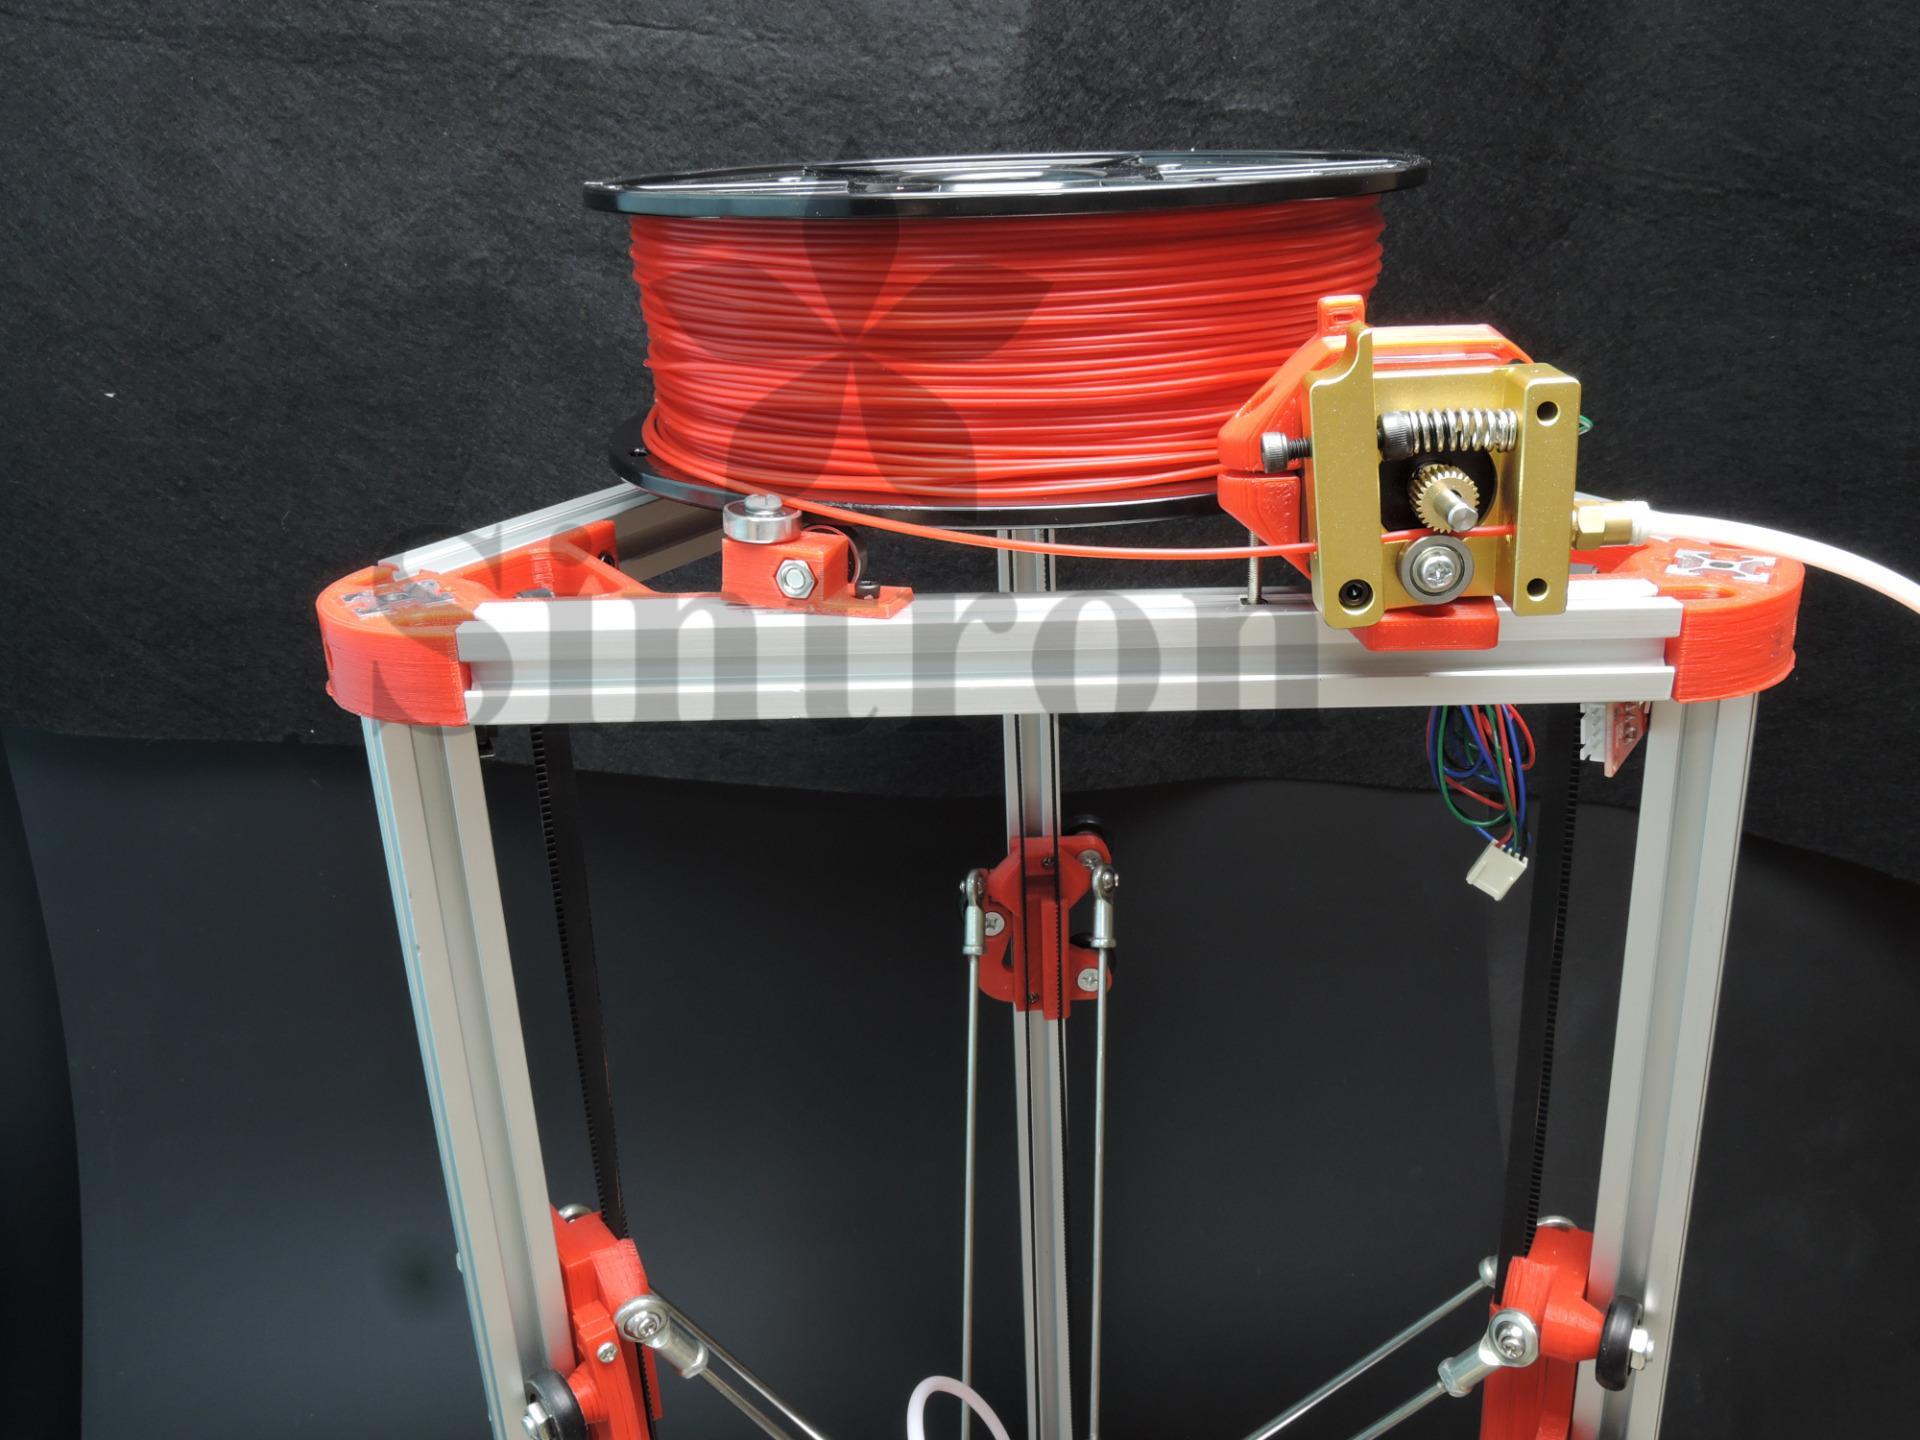 kossel mini rostock 3d printer 625 2rs bearing for. Black Bedroom Furniture Sets. Home Design Ideas